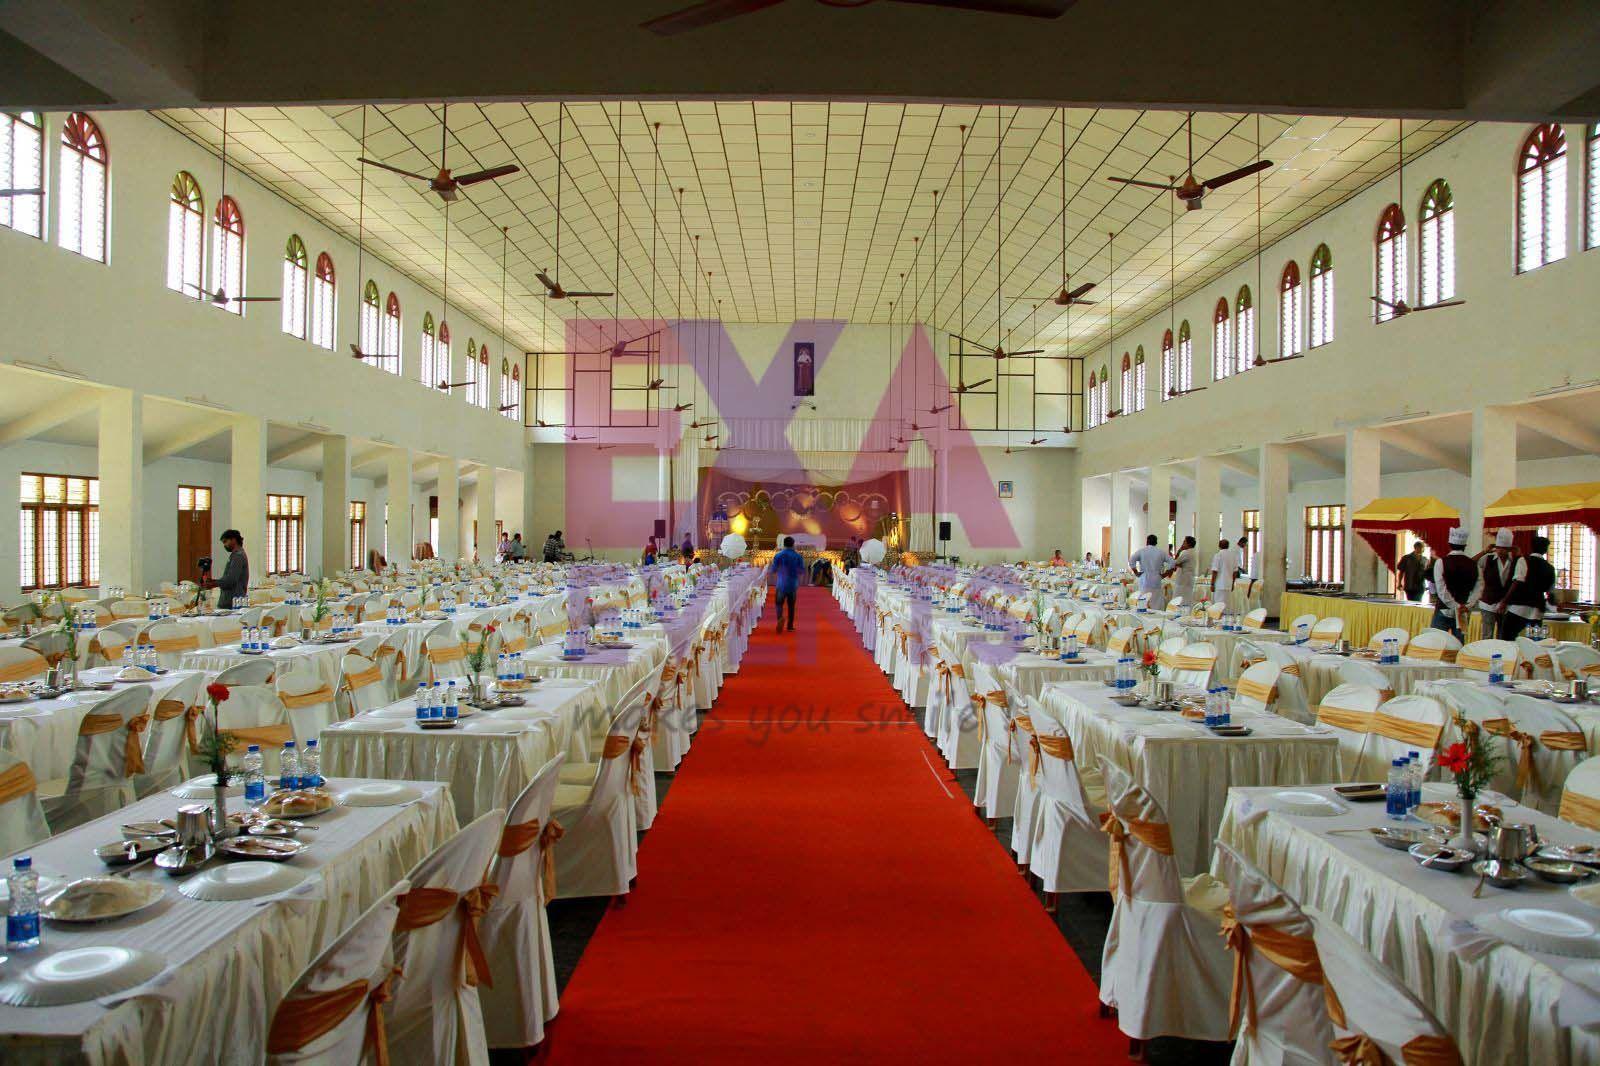 Wedding stage decoration ideas kerala  Kerala Christian wedding decor Kottayam Christian wedding Decor